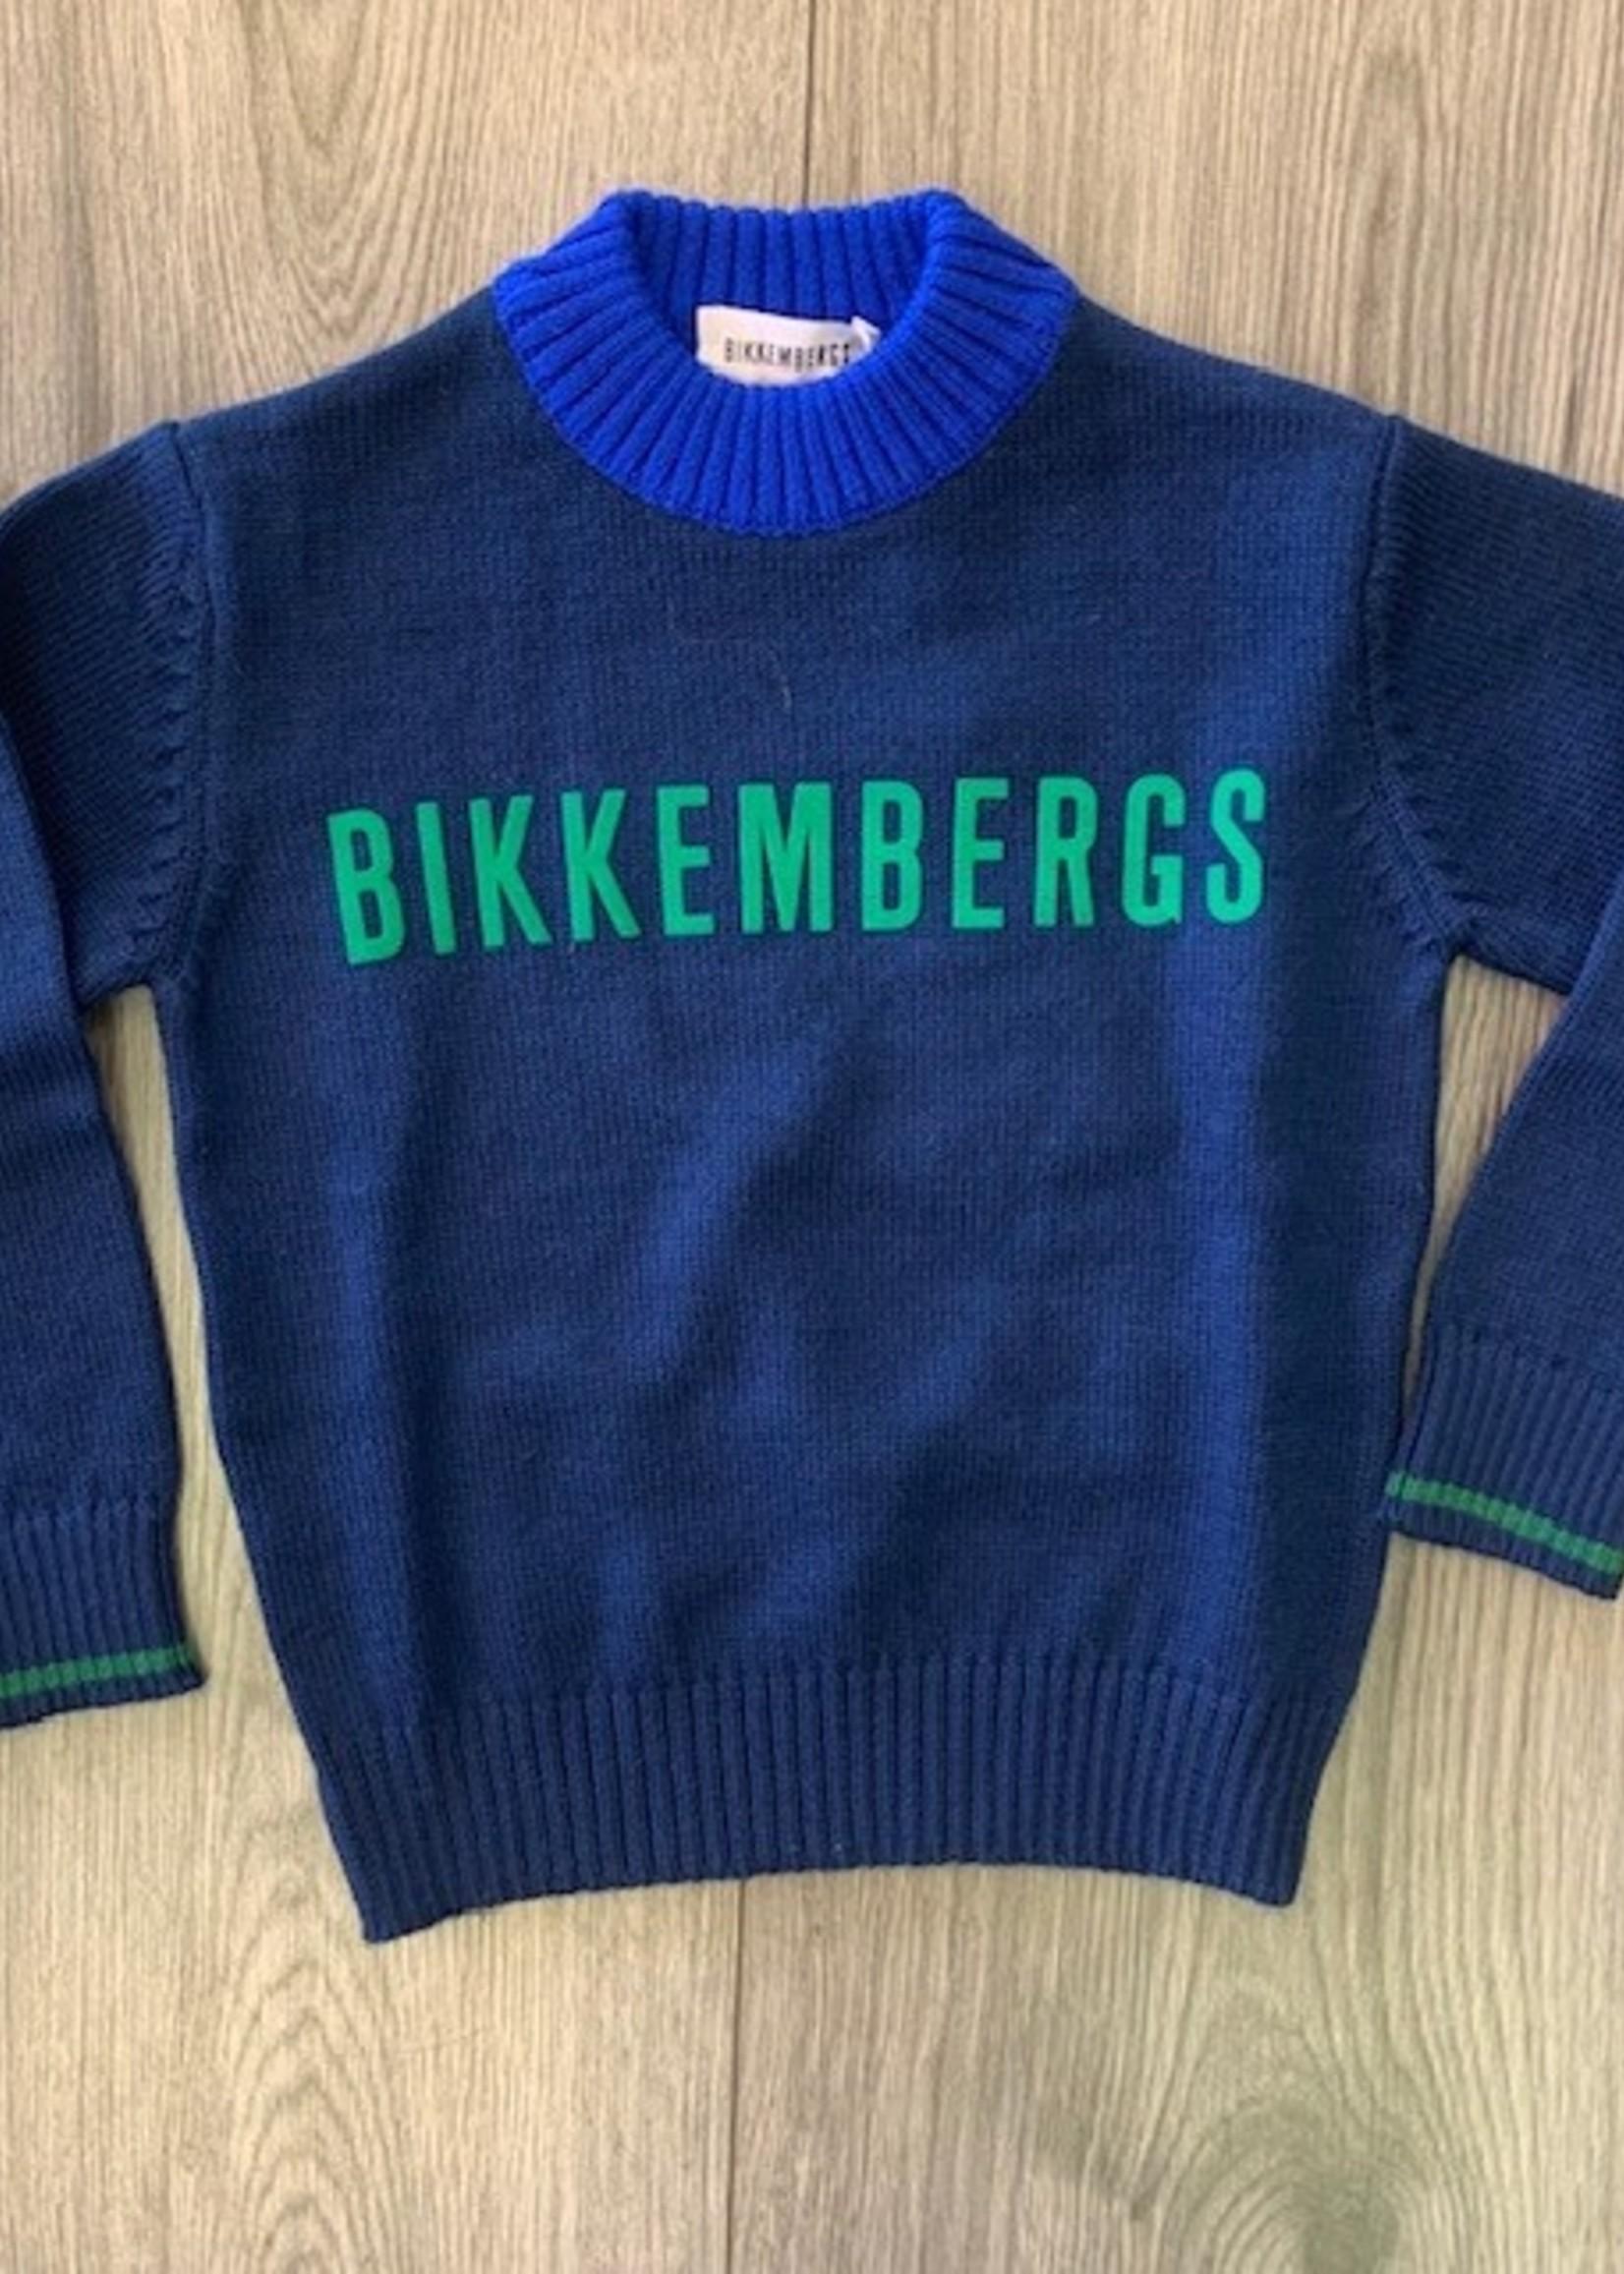 Bikkembergs BIKKEMBERGS SWEATER NAVY BLUE.